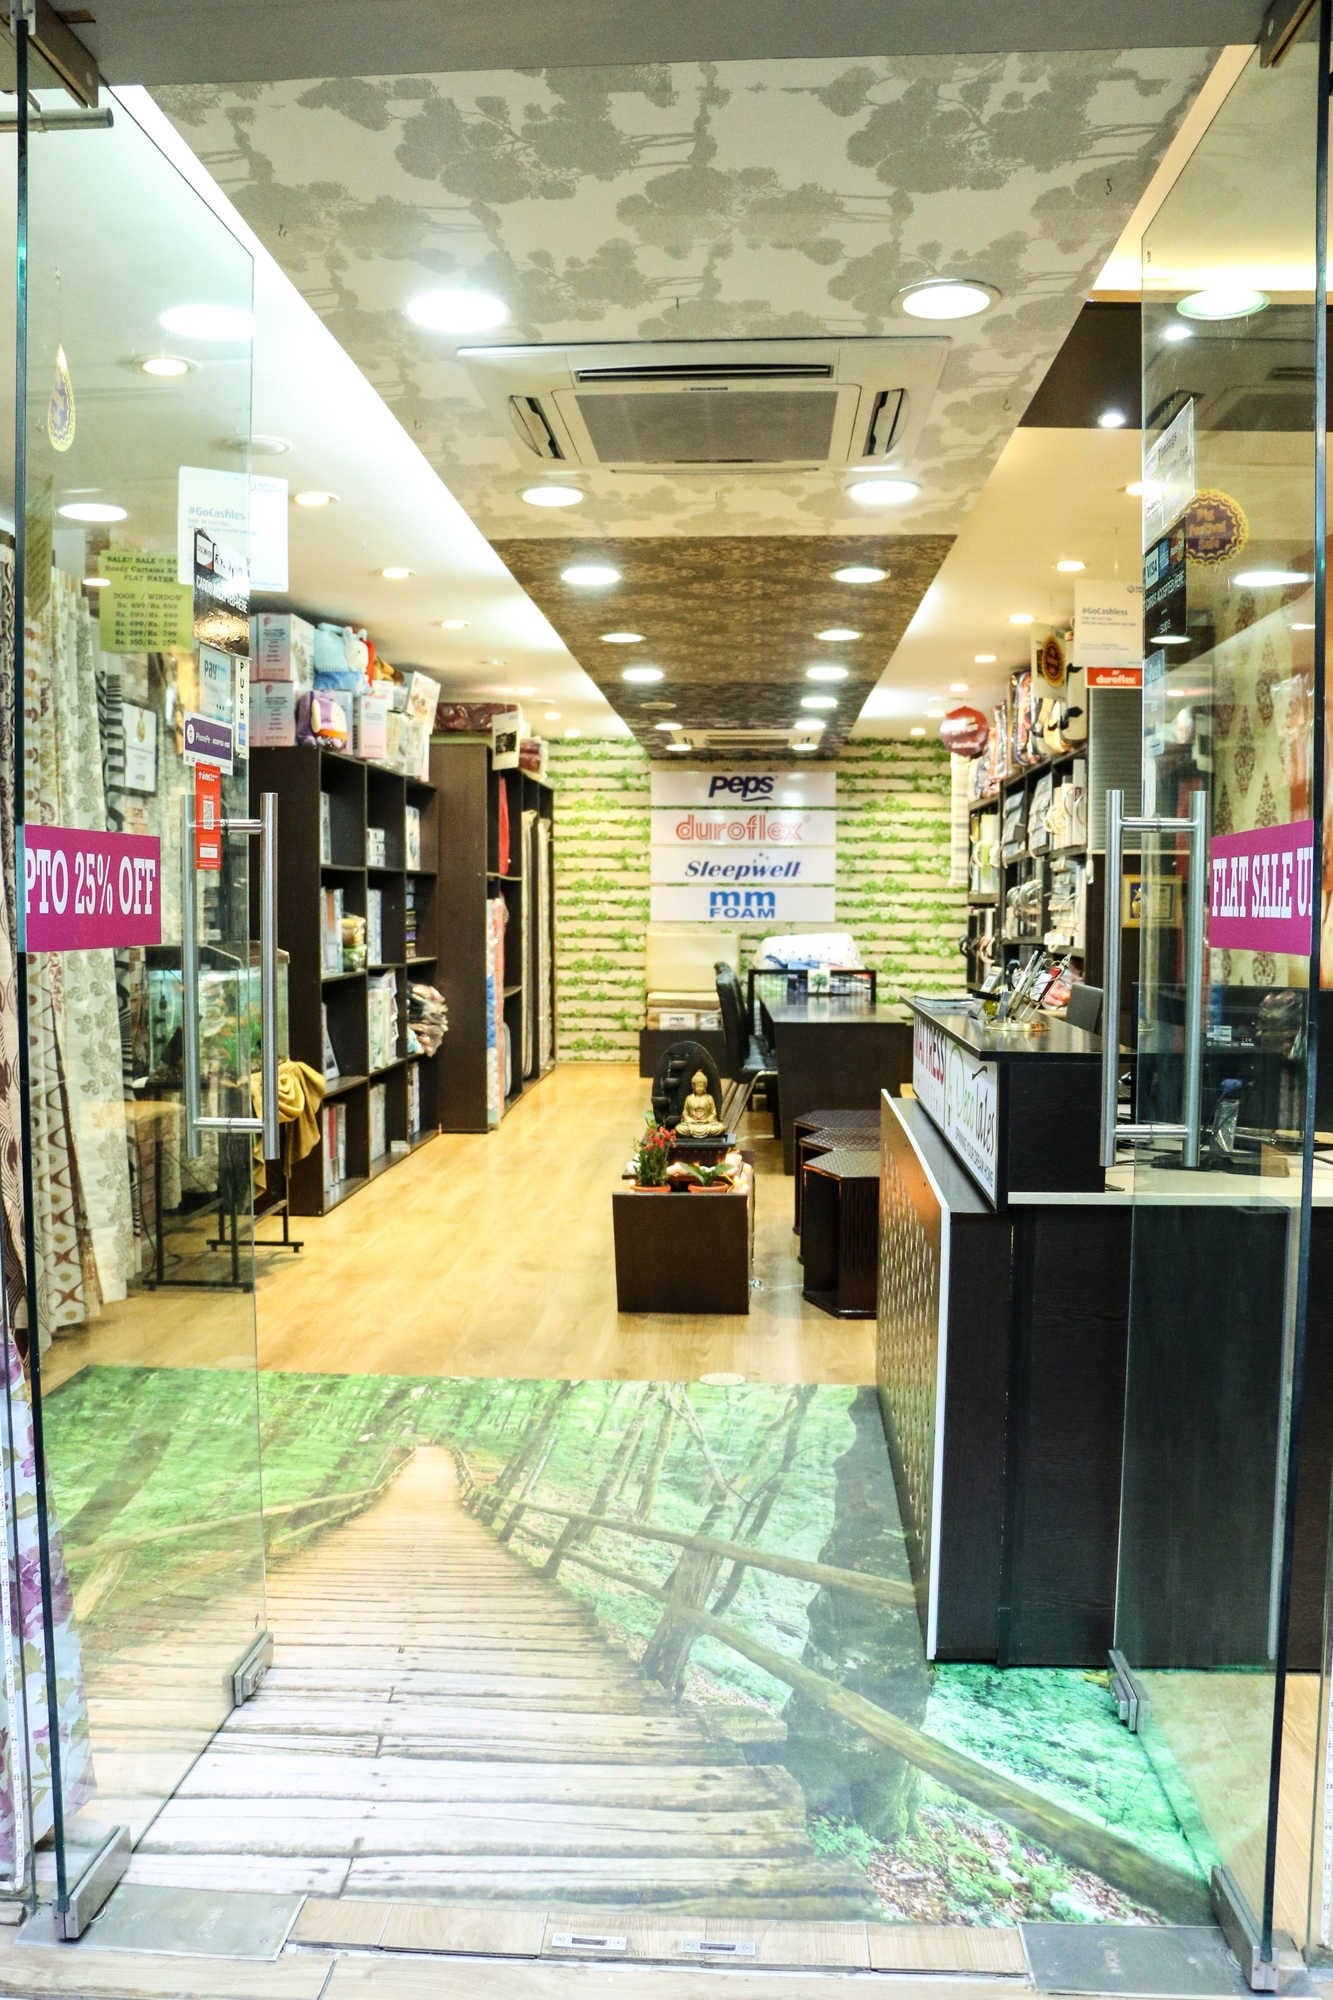 Top Wall Paper Dealers in Whitefield - Best Wallpaper Wholesalers ...